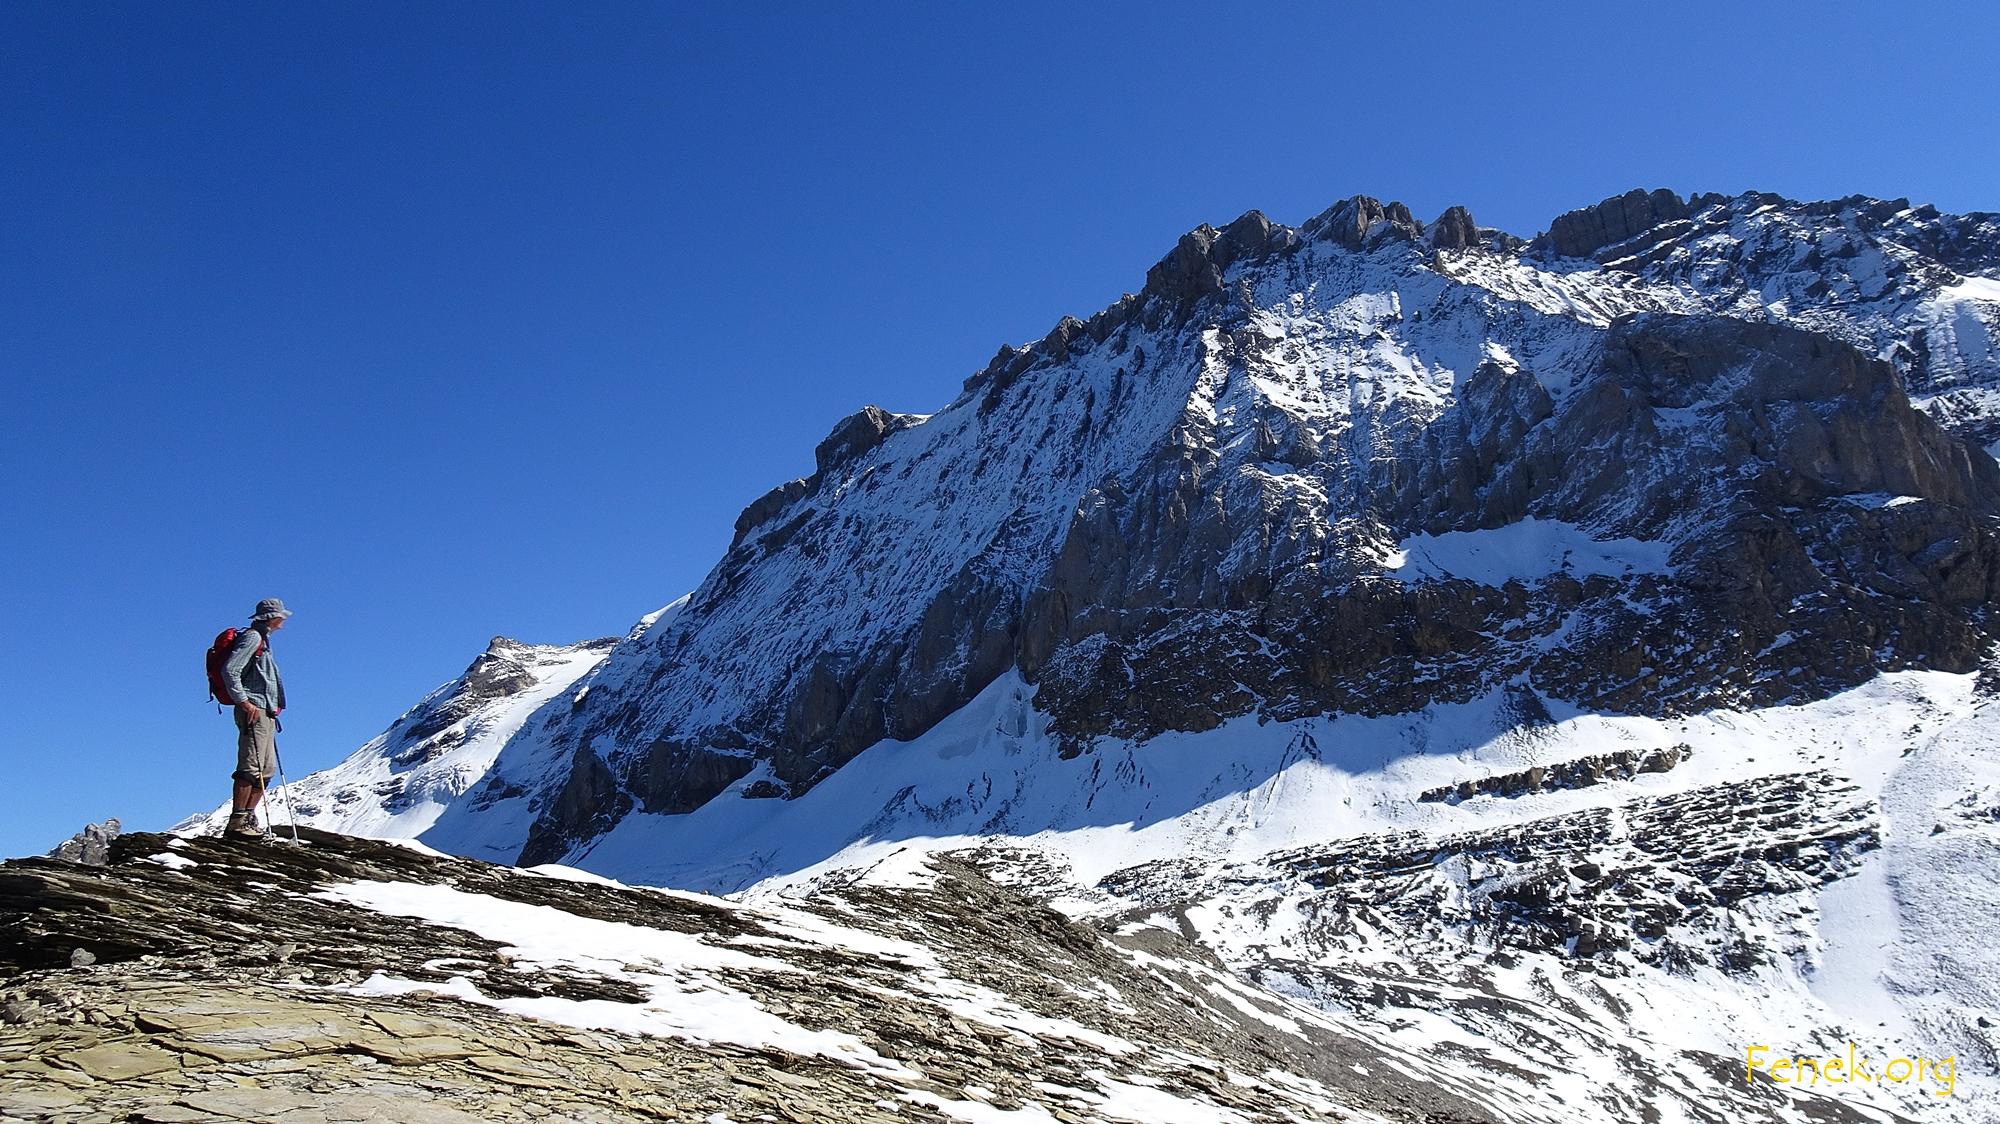 des Bergsteigers Blick wandert zum Wildstrubel hinauf....